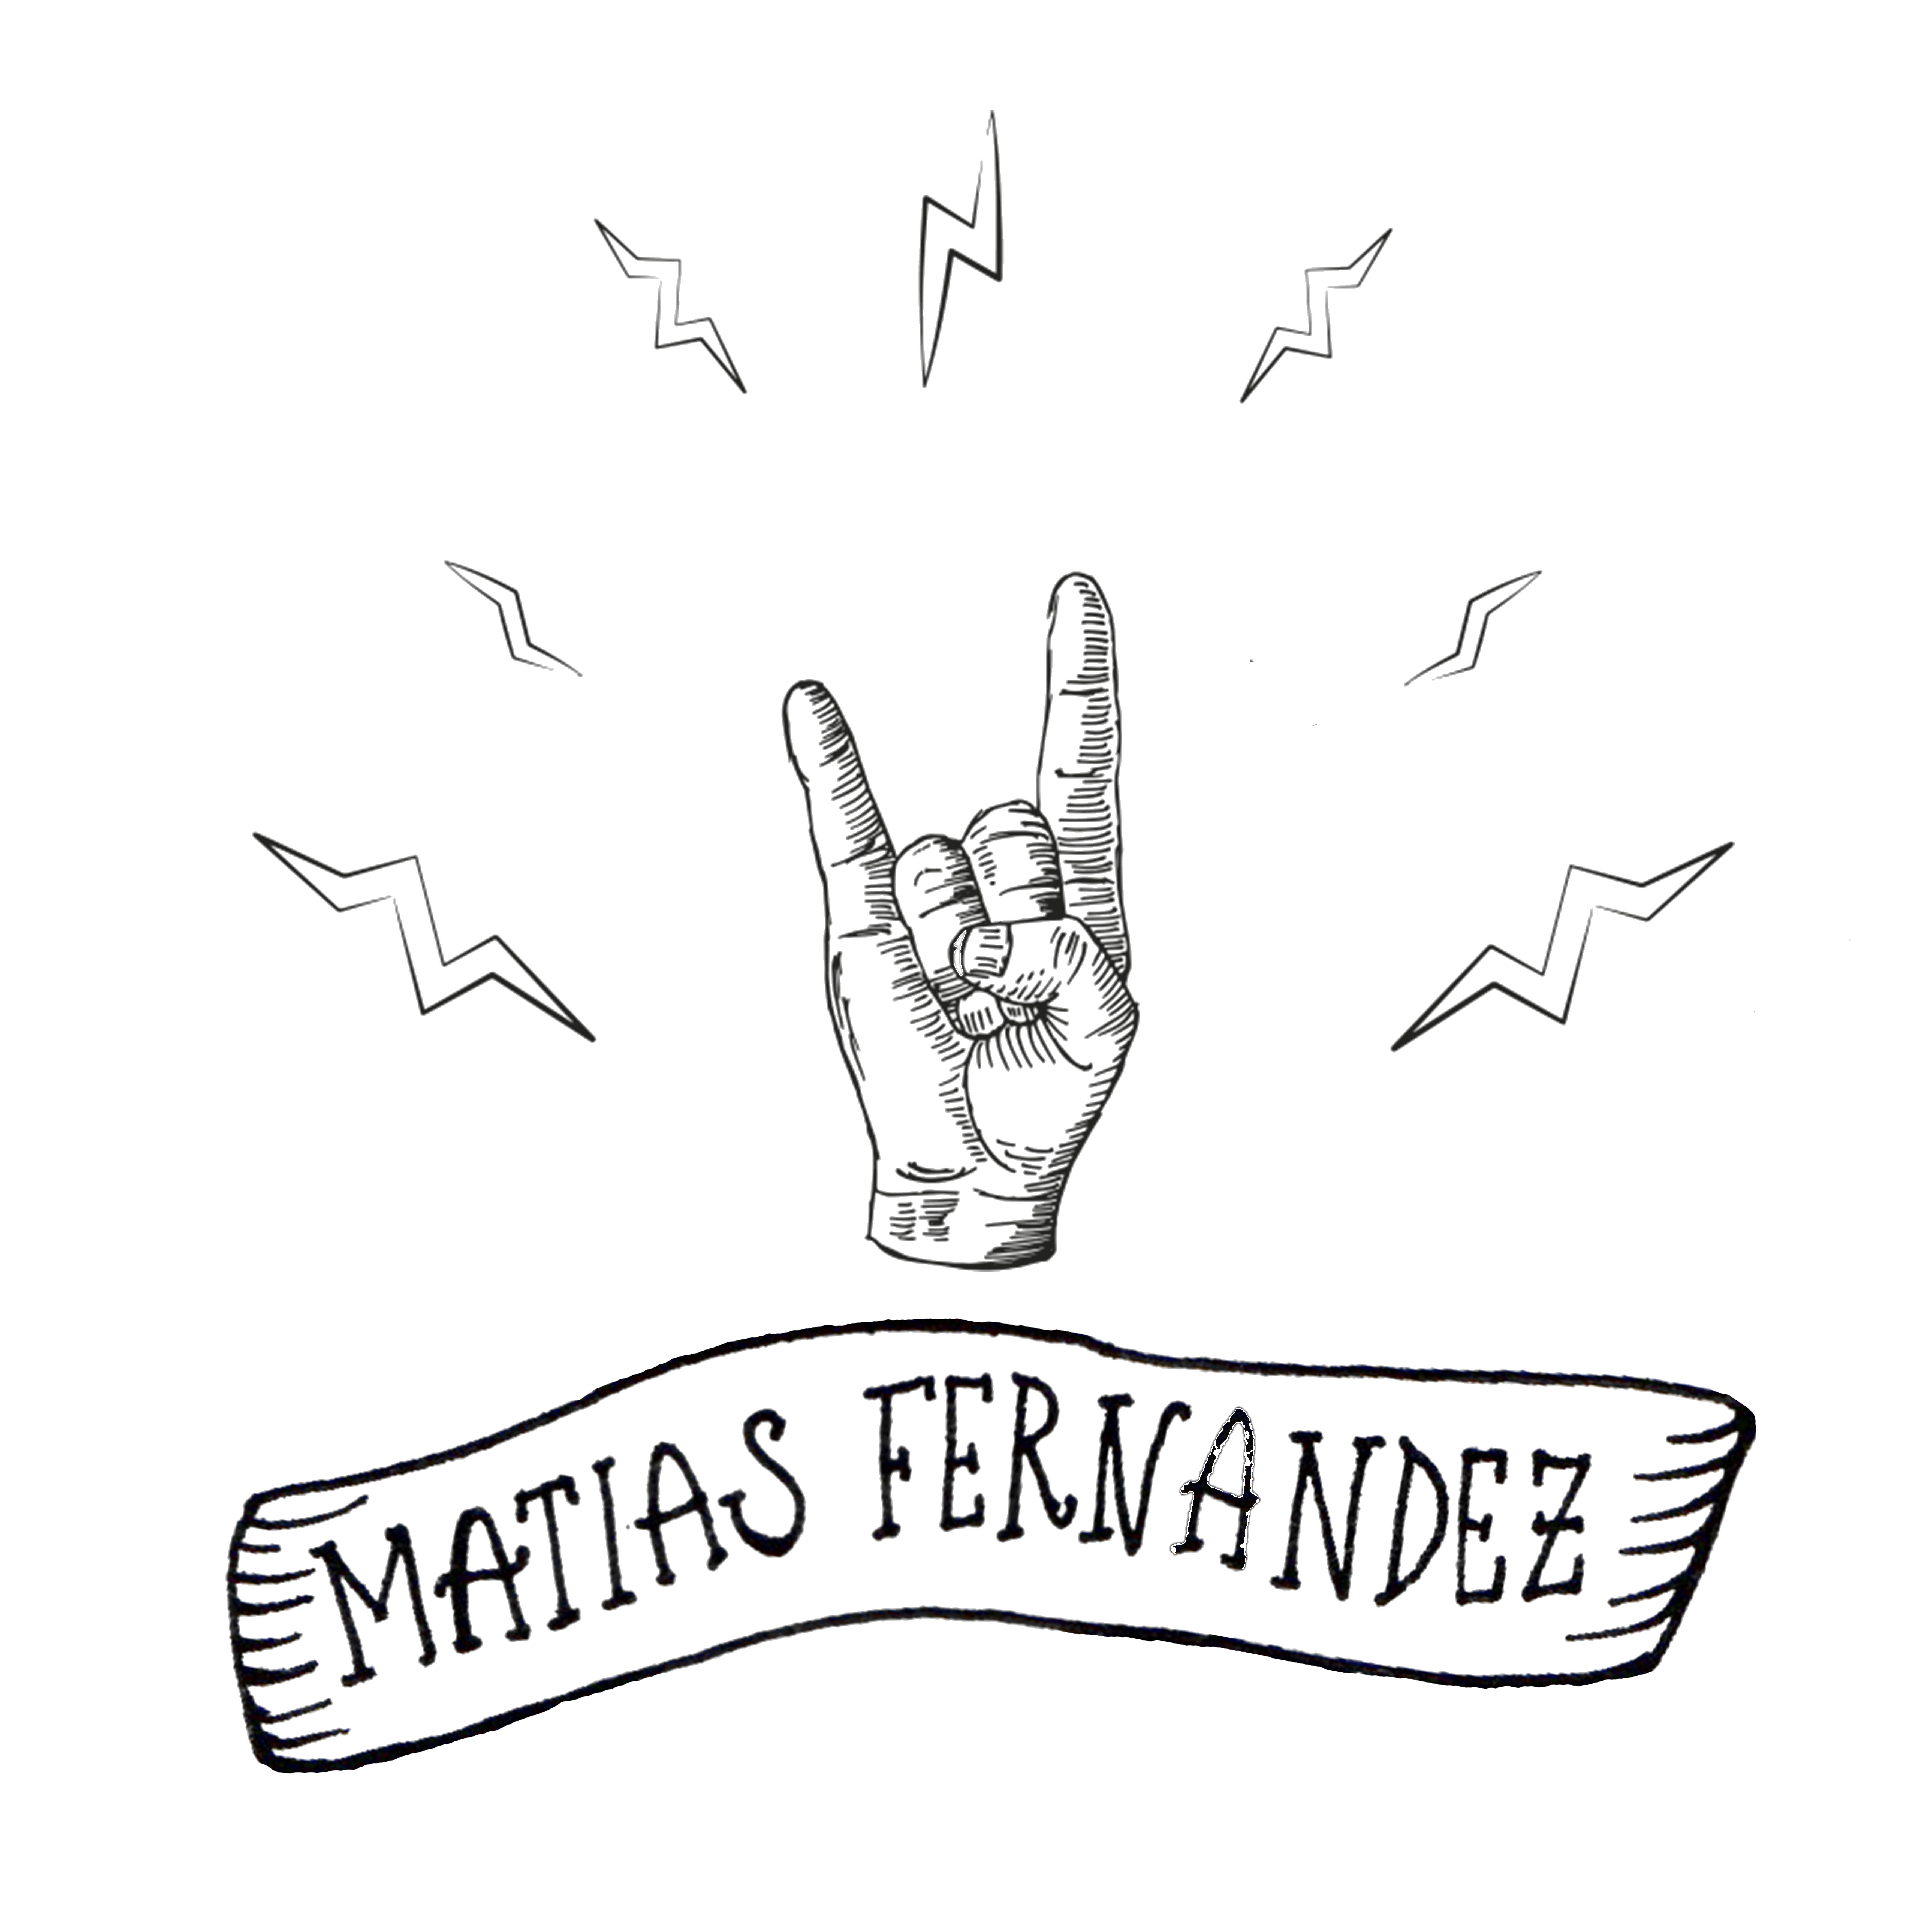 logo2020 - matias fernandez - phmatiasfernandez